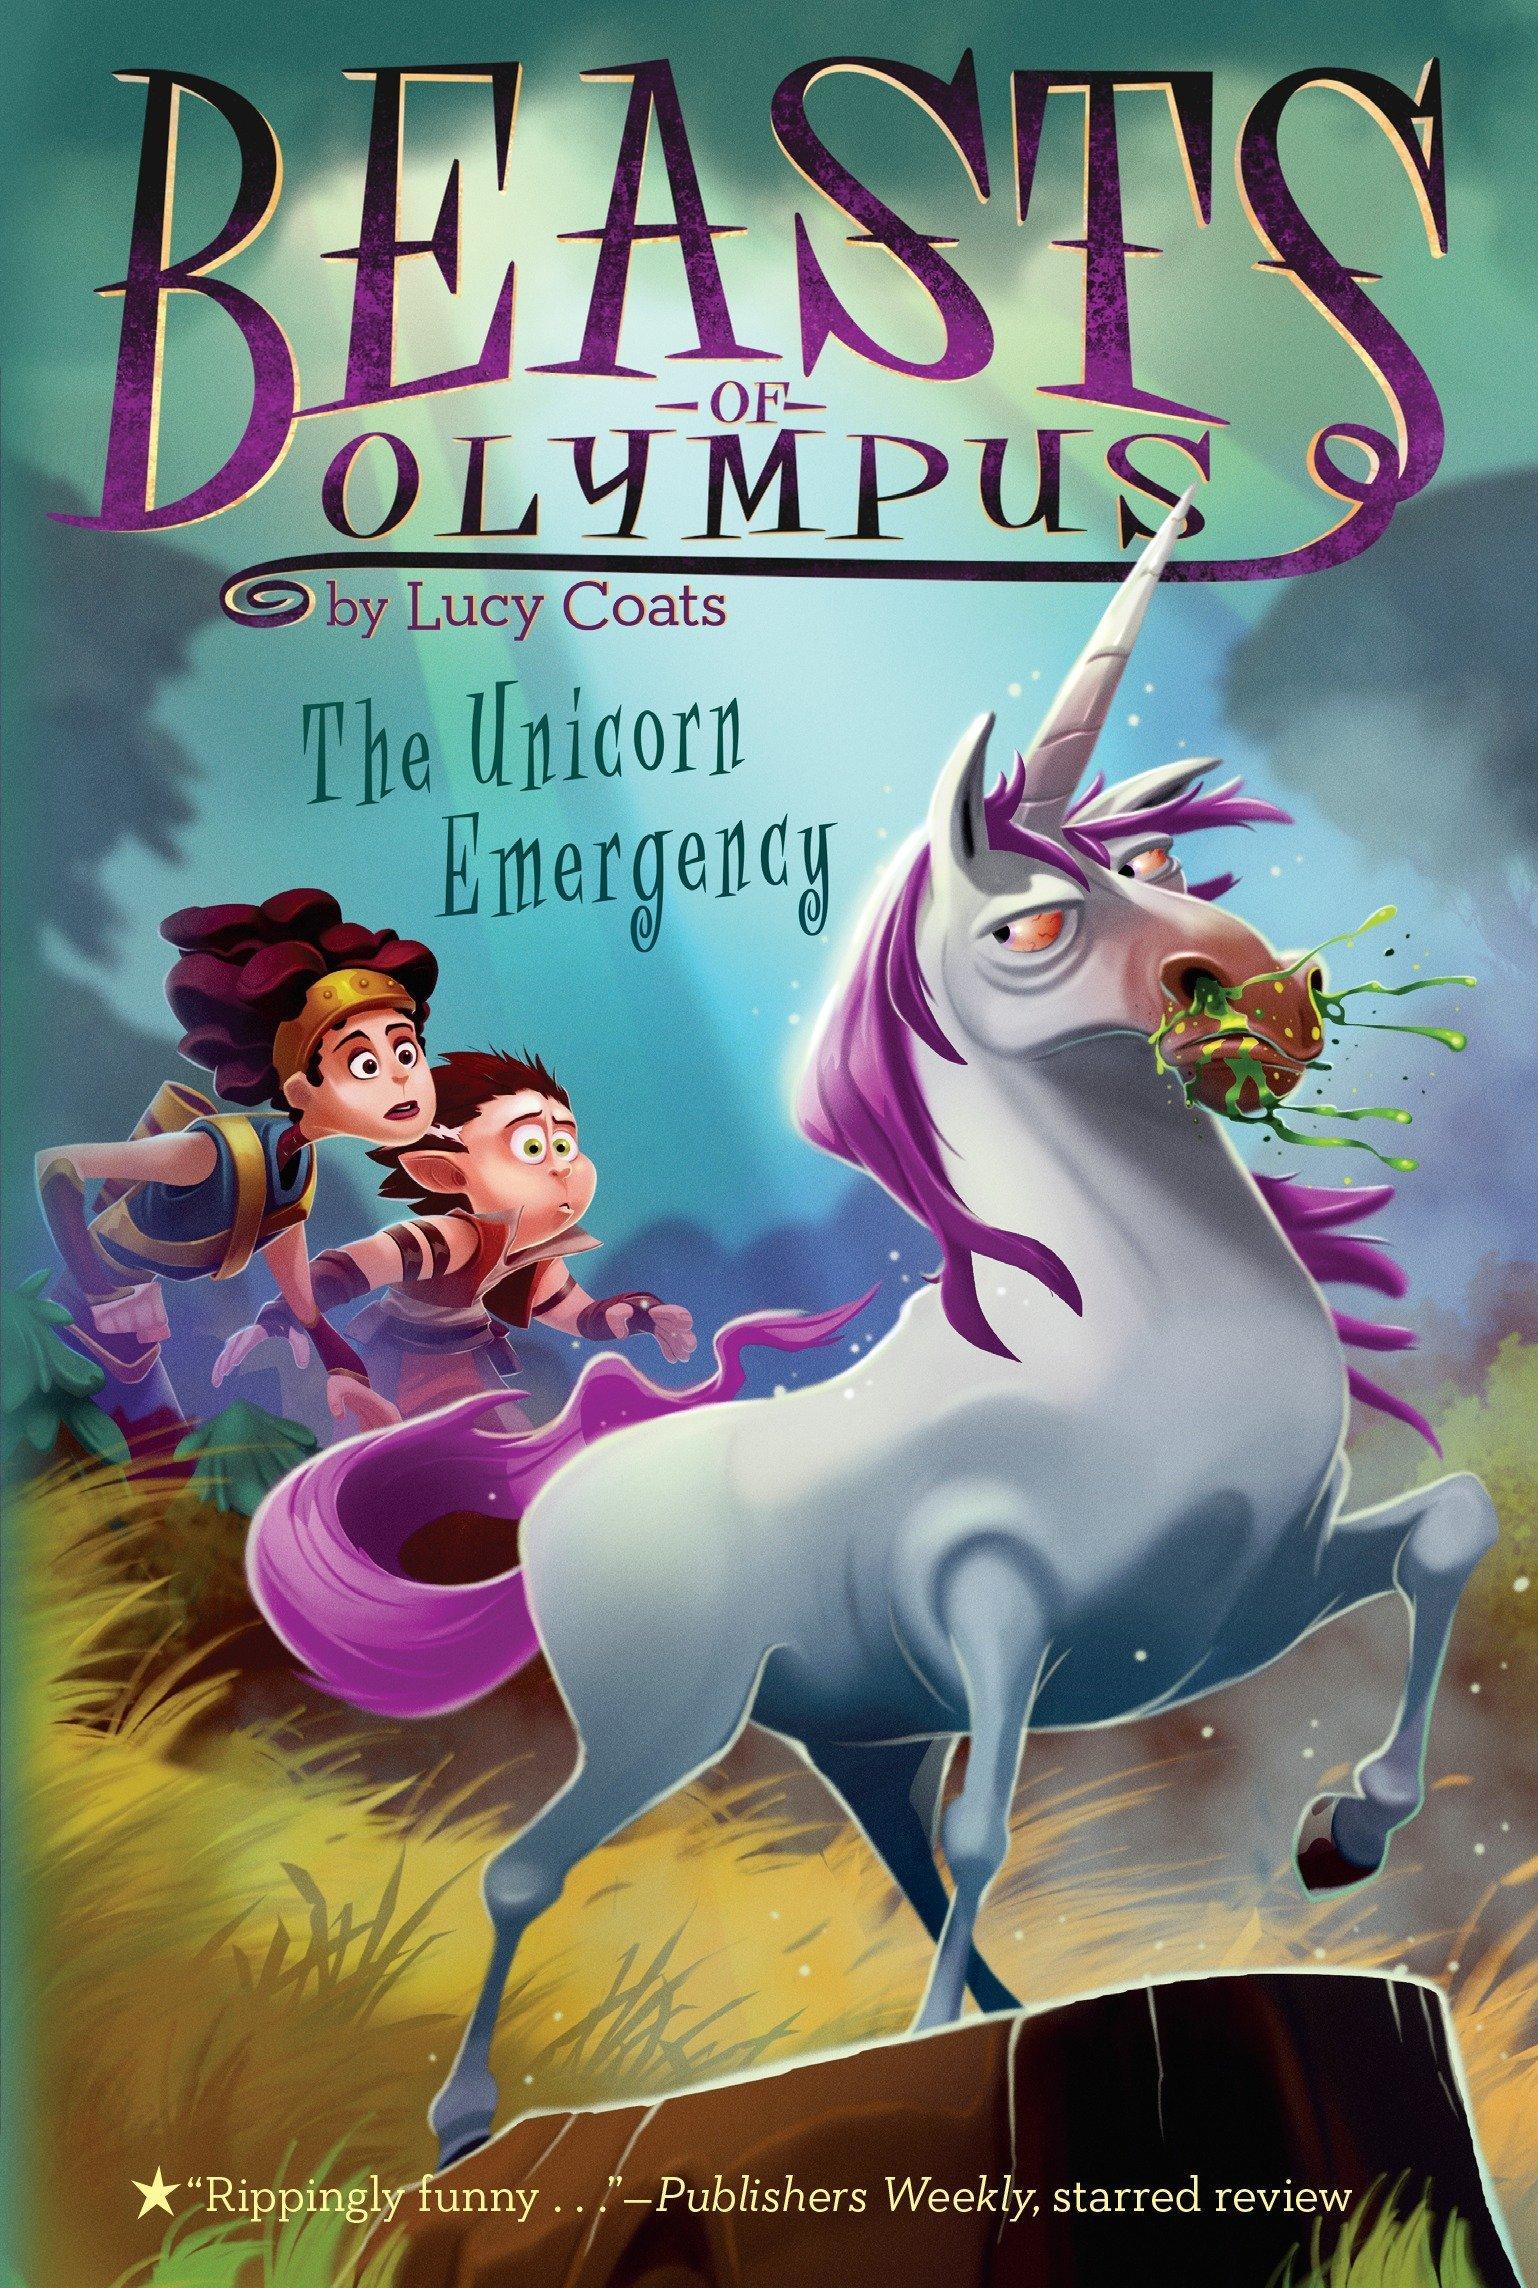 Download The Unicorn Emergency #8 (Beasts of Olympus) PDF